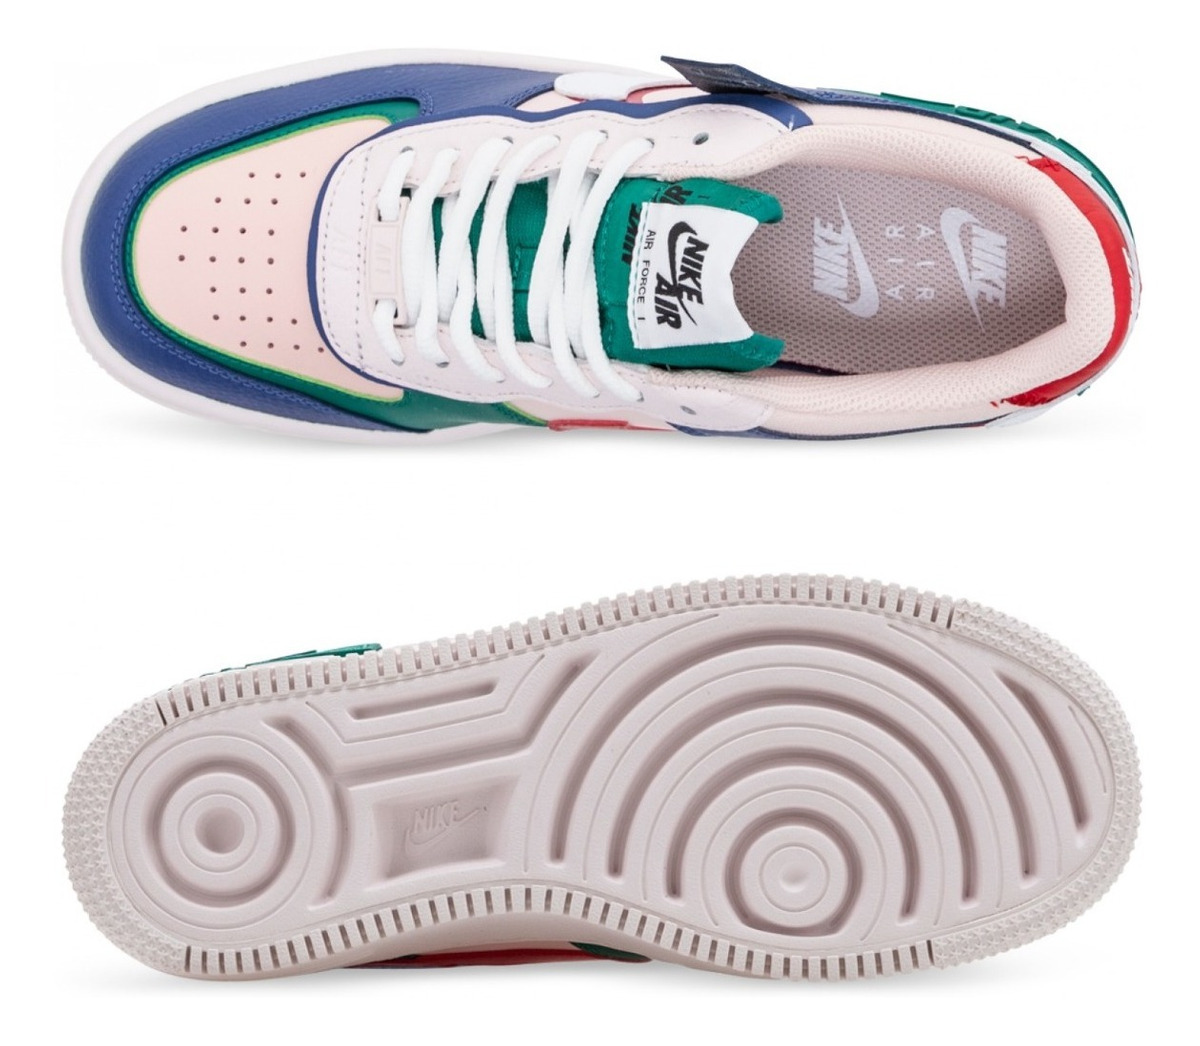 Nike Air Force 1 Low Zapatillas Mujer 100 % 0riginales Cod 0029